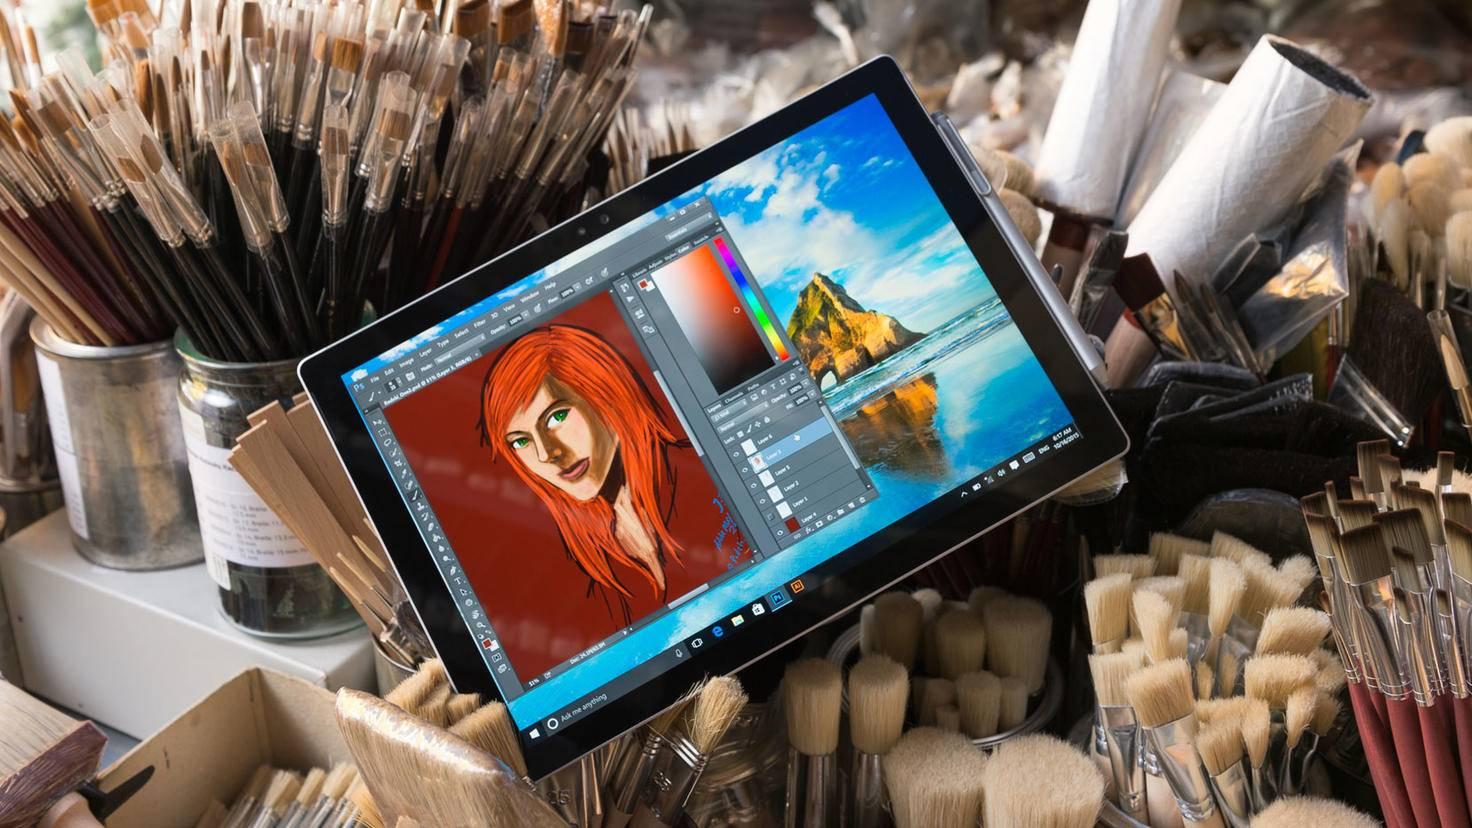 Windows 10 Surface